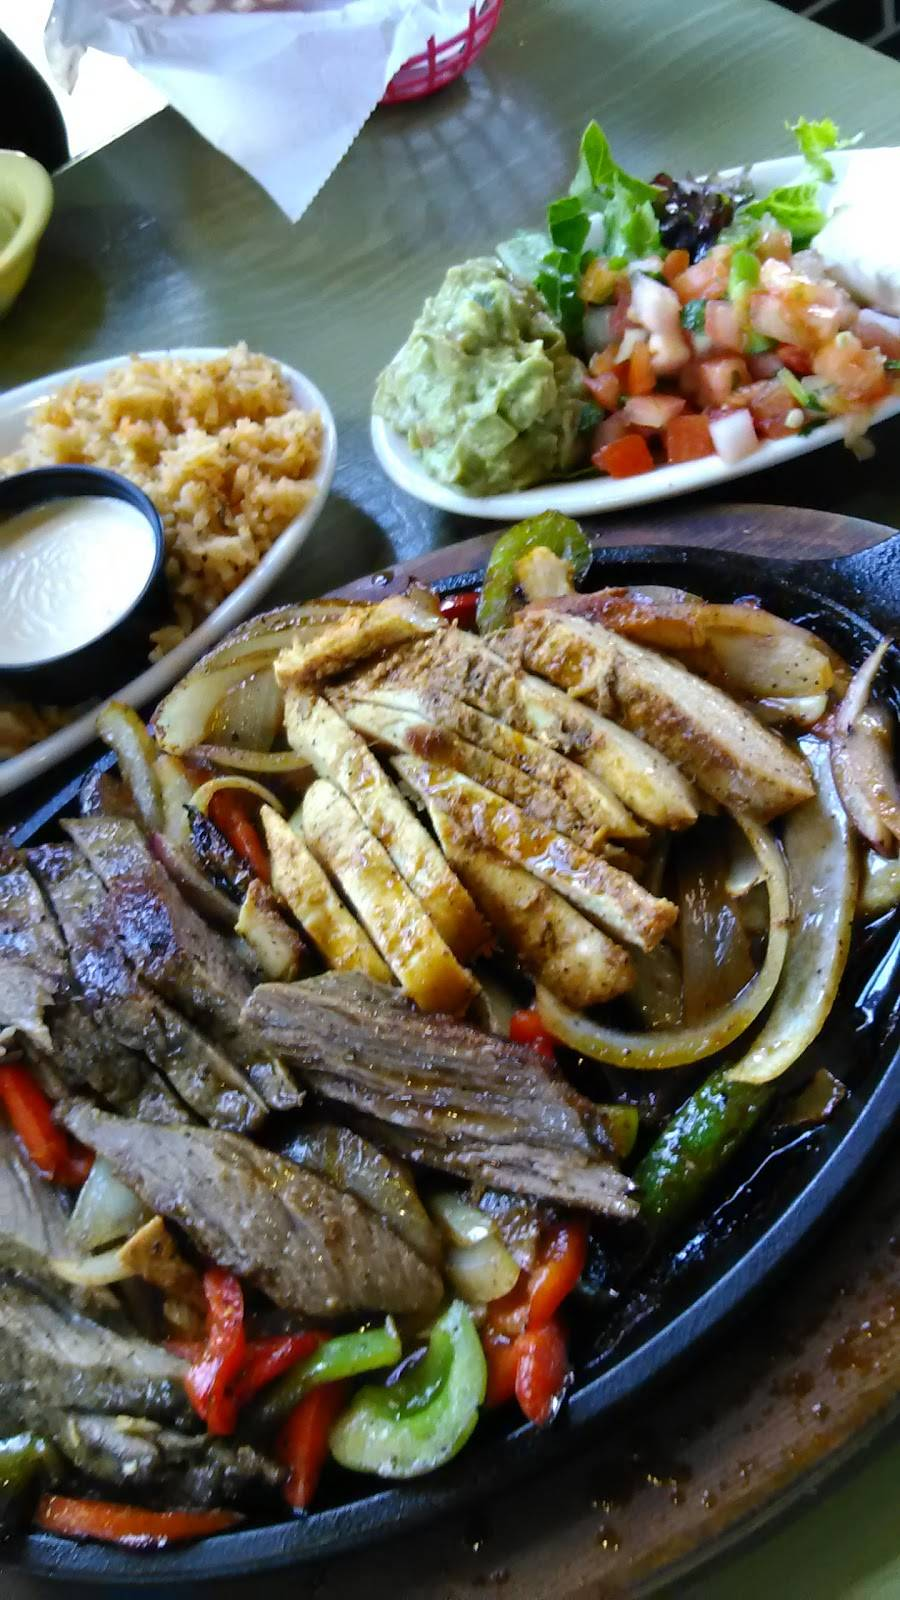 Berryhill | restaurant | 1201 W 43rd St, Houston, TX 77018, USA | 2818226111 OR +1 281-822-6111